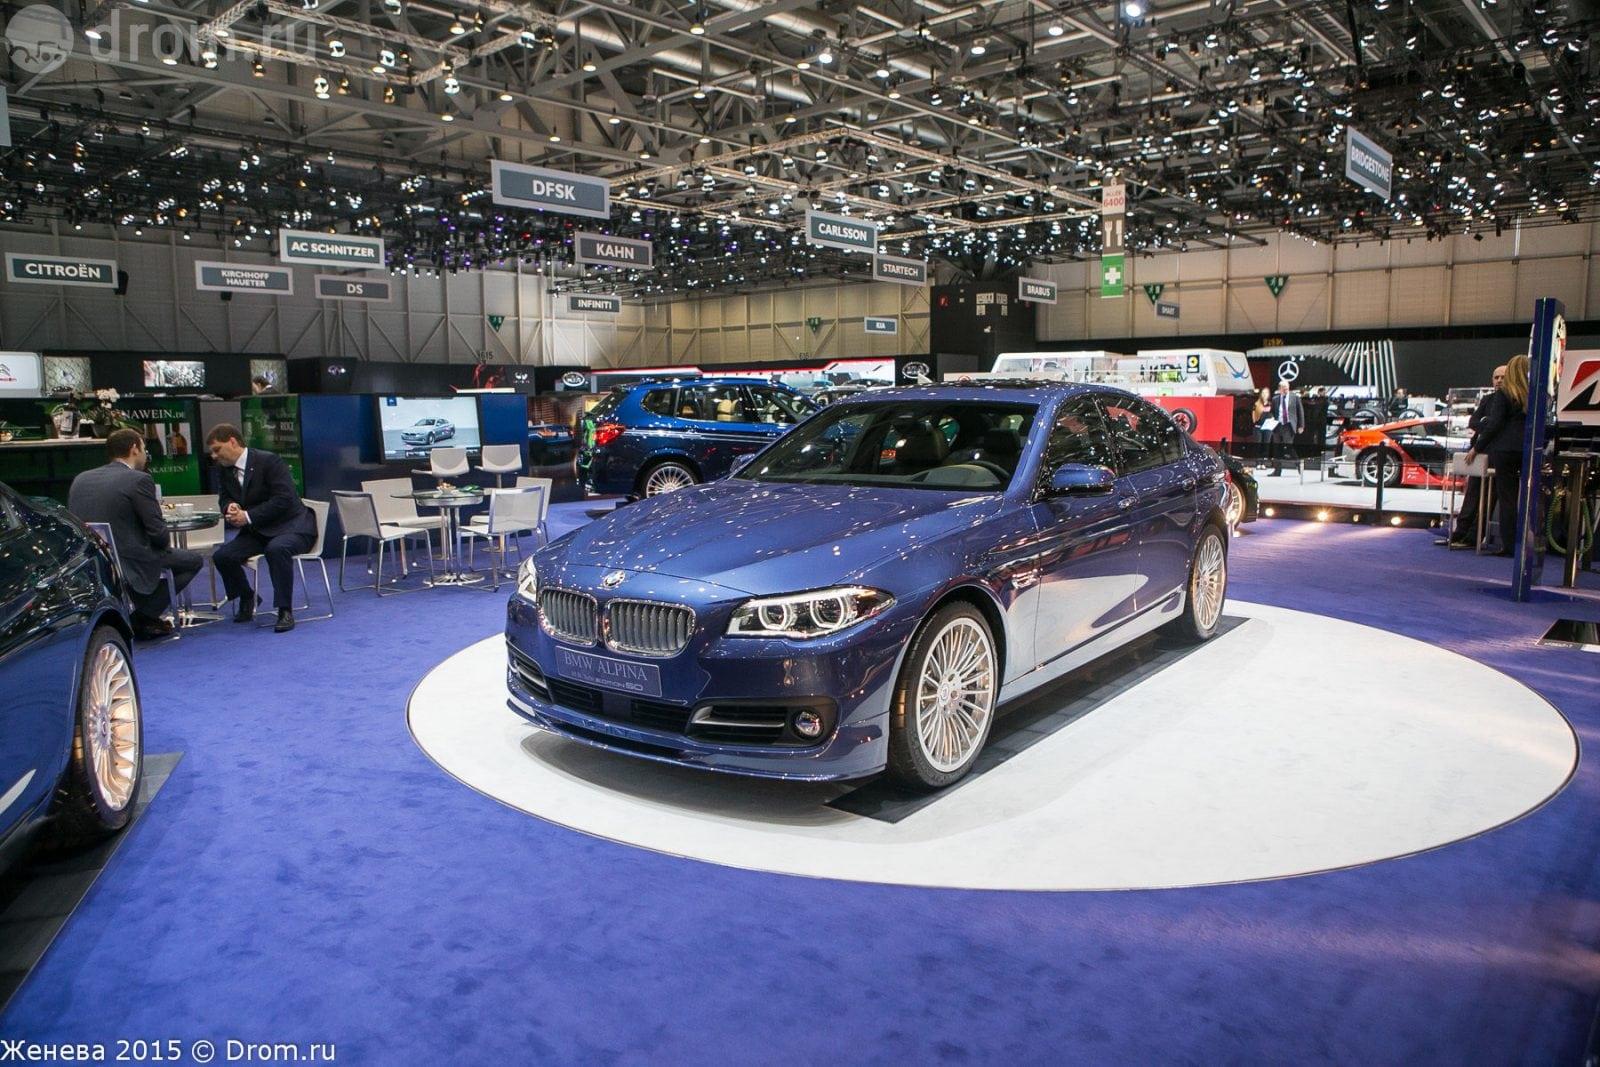 Новая BMW Alpina B5 Bi turbo на автосалоне в Женеве, 2015 год